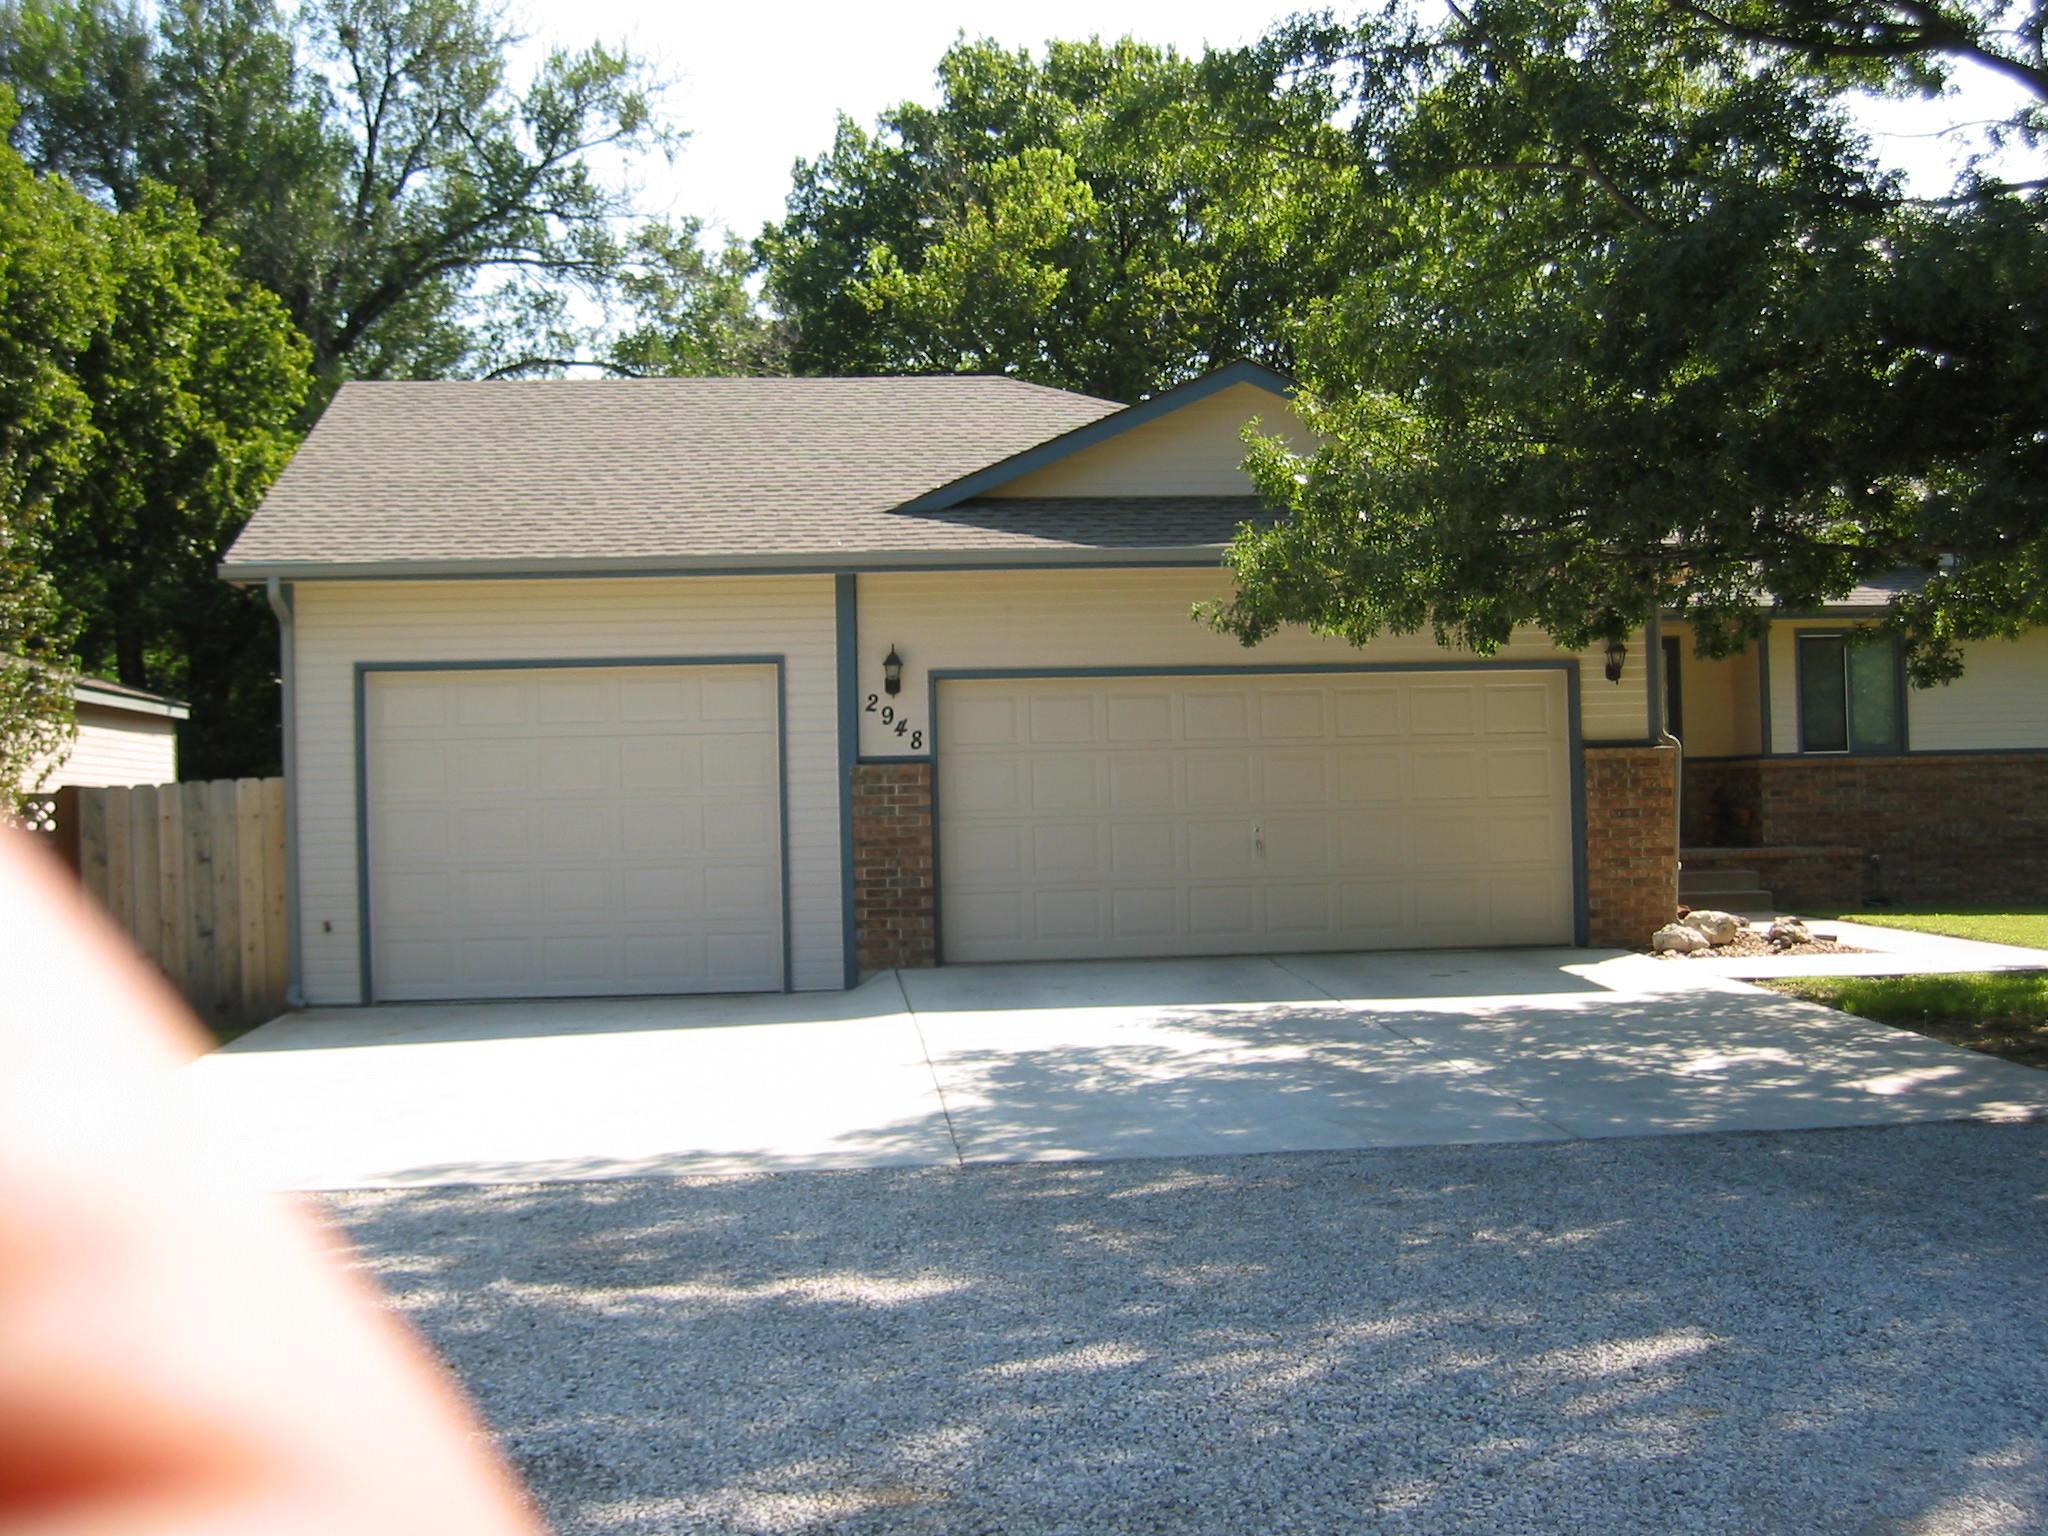 Kansas Siding Amp Home Improvements Inc Coupons Near Me In